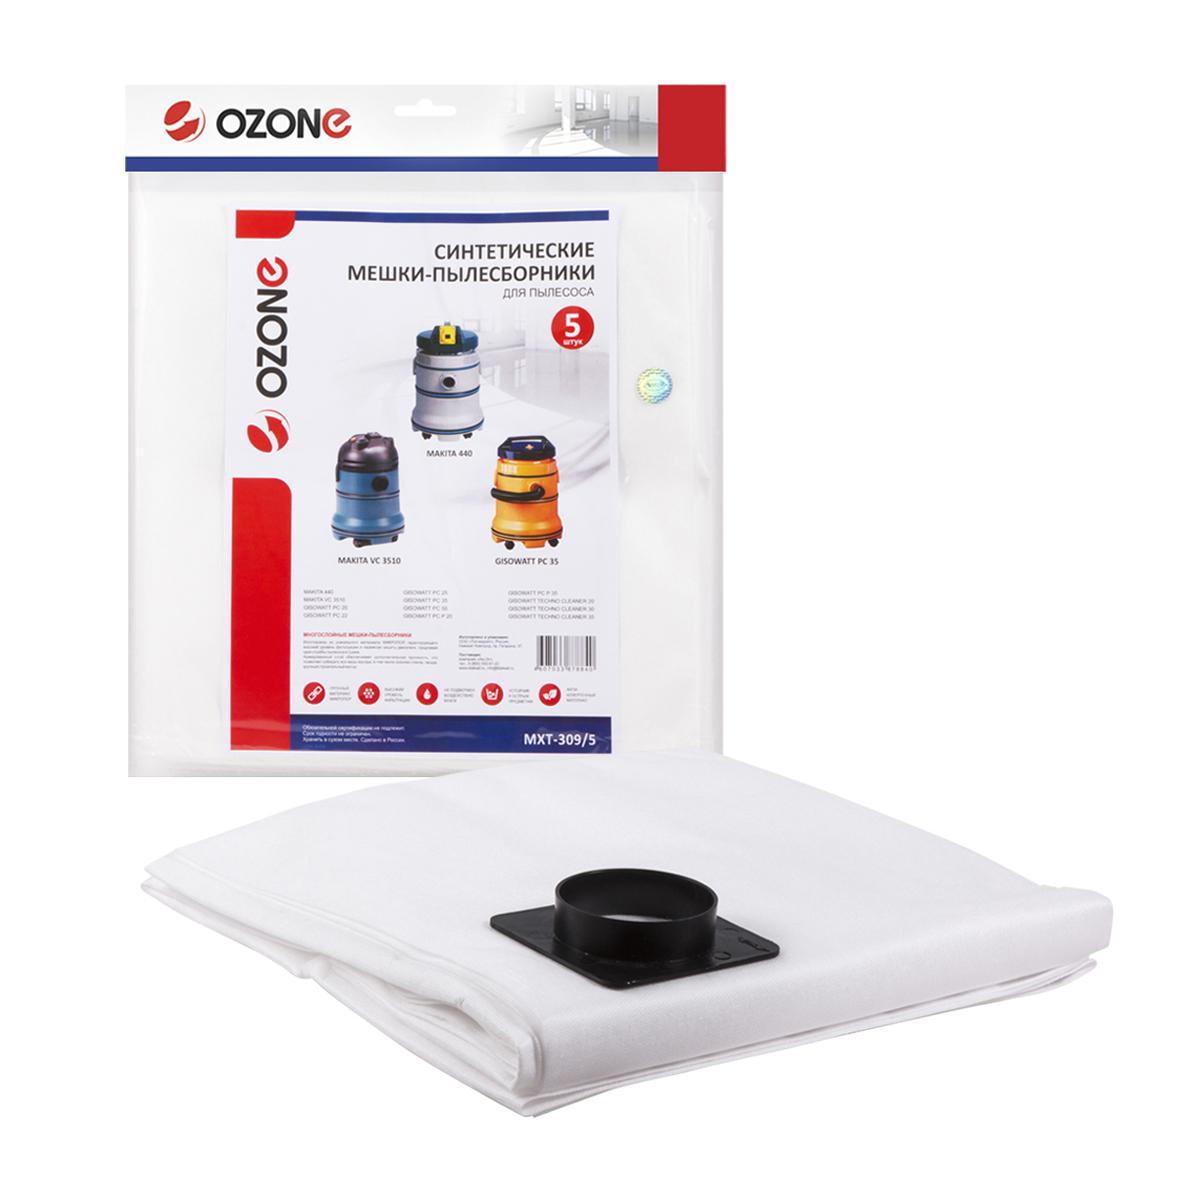 Мешок Ozone Mxt-309/5 мешок ozone mxt un10 5